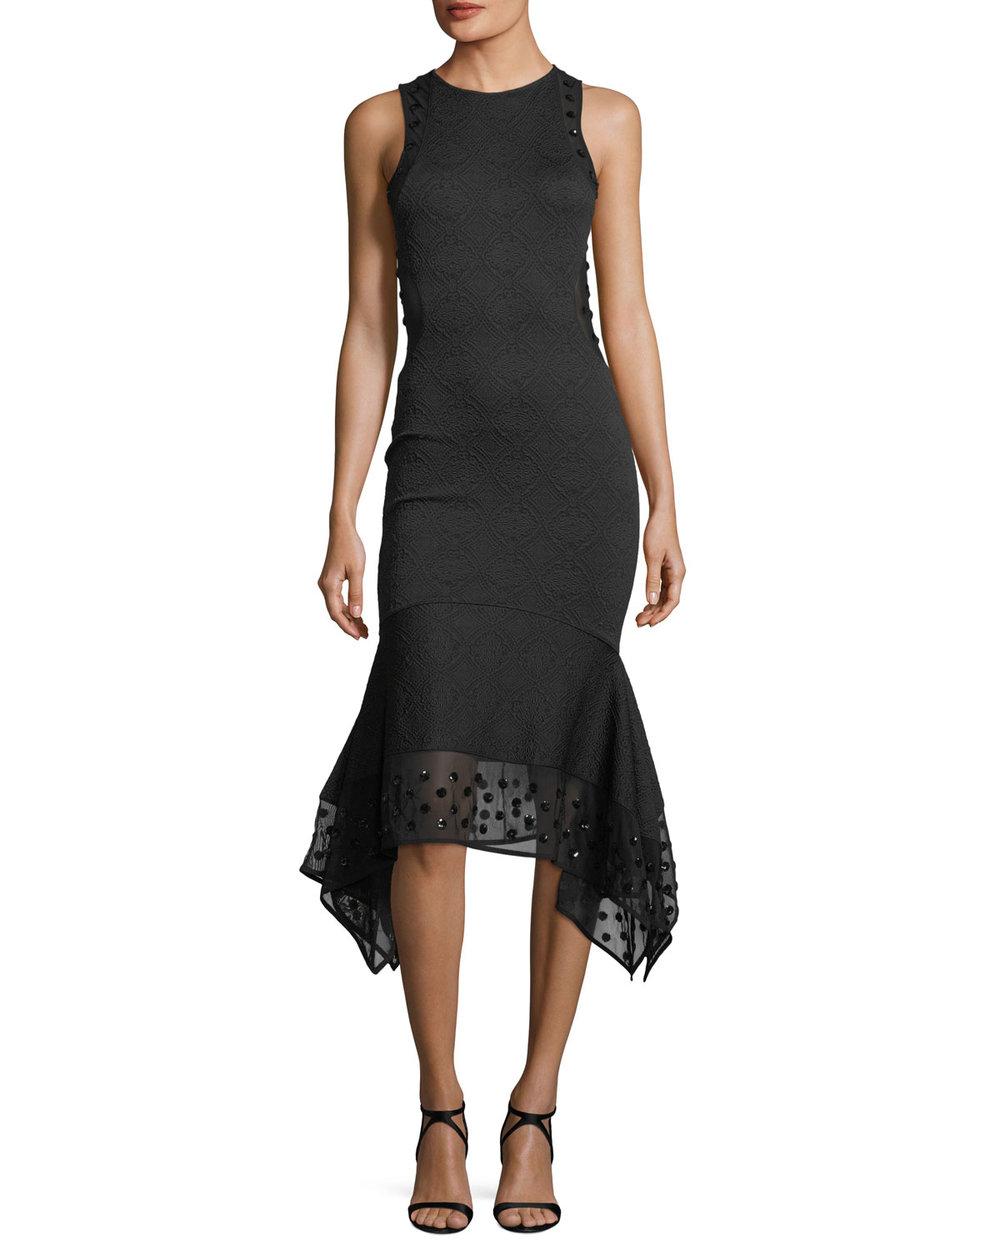 OPENING CEREMONY Medallion jacquard midi dress, $550 Neimanmarcus.com